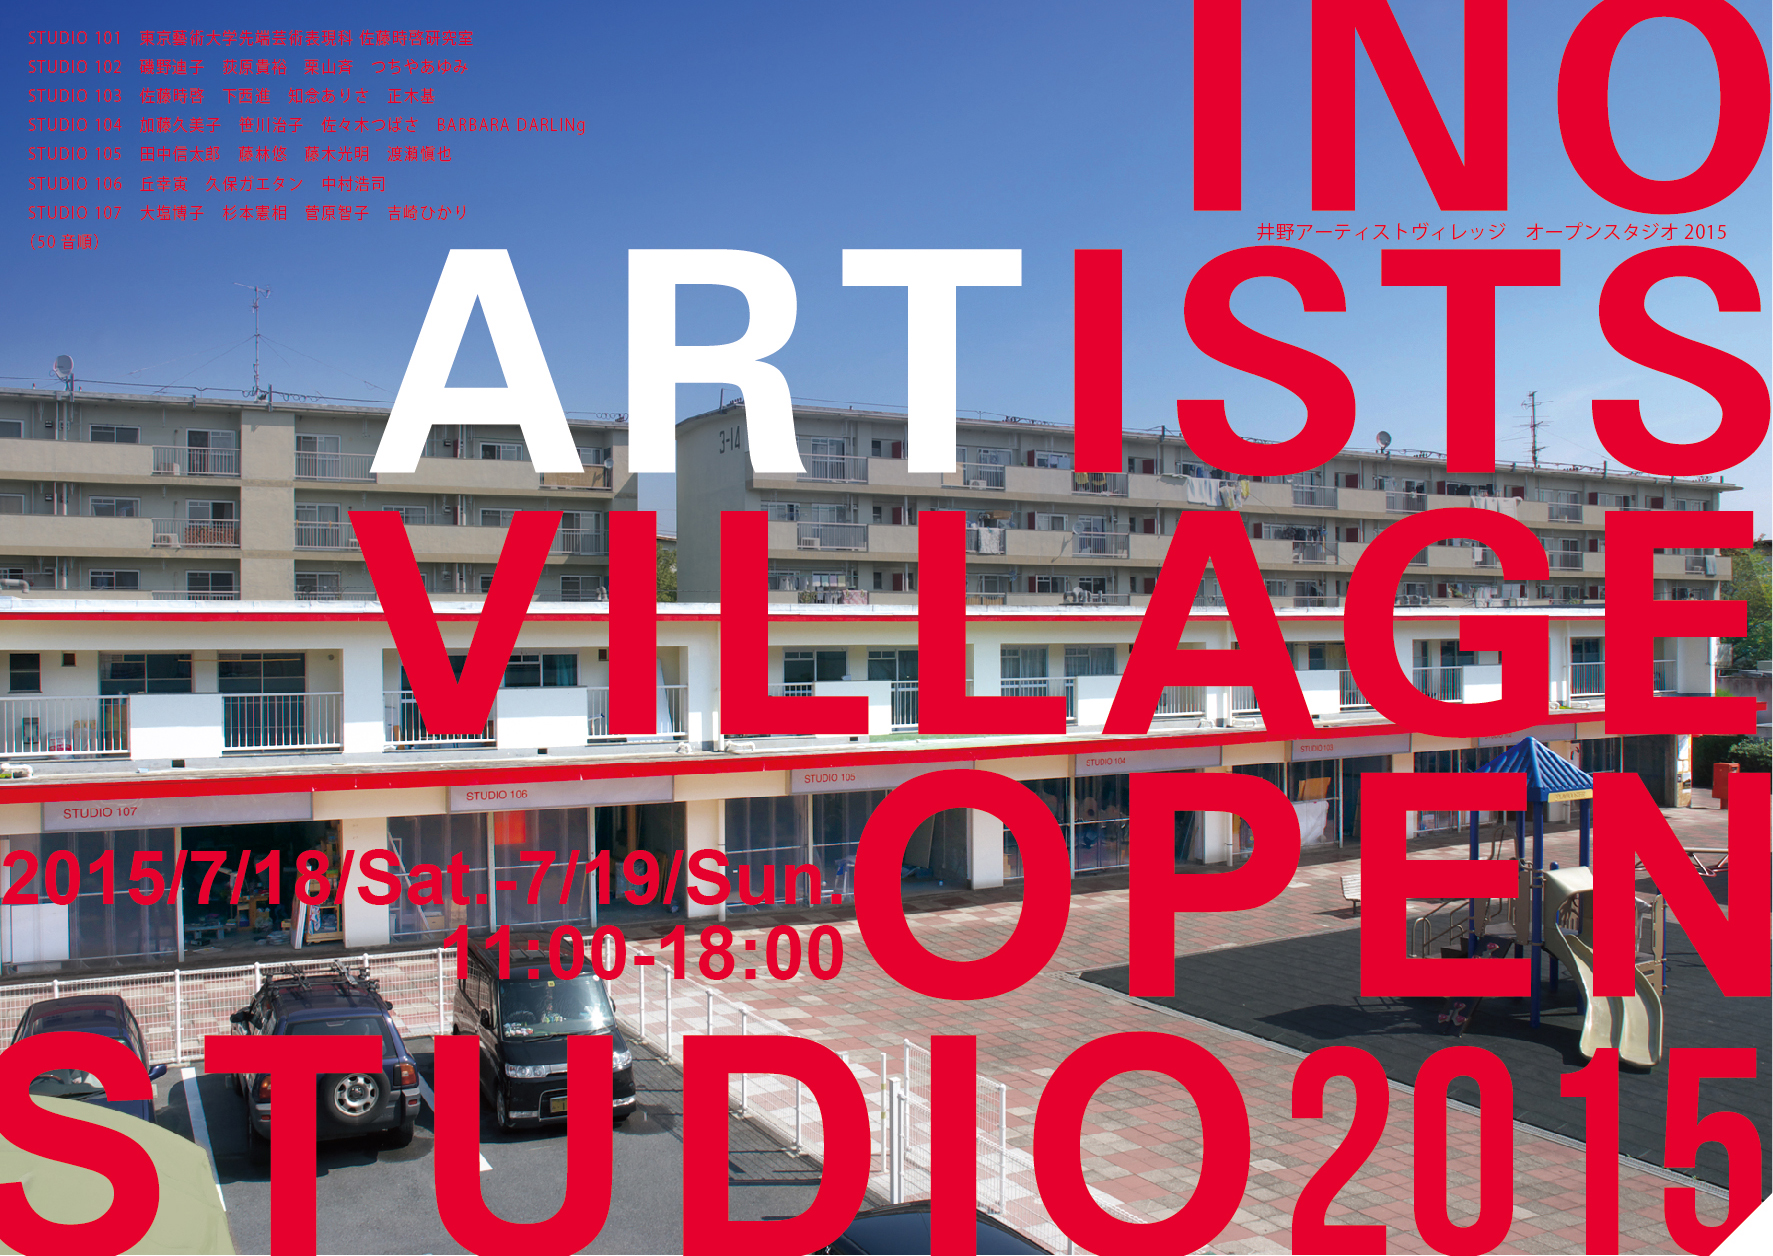 INO ARTISTS VILLAGE OPEN STUDIO 2015